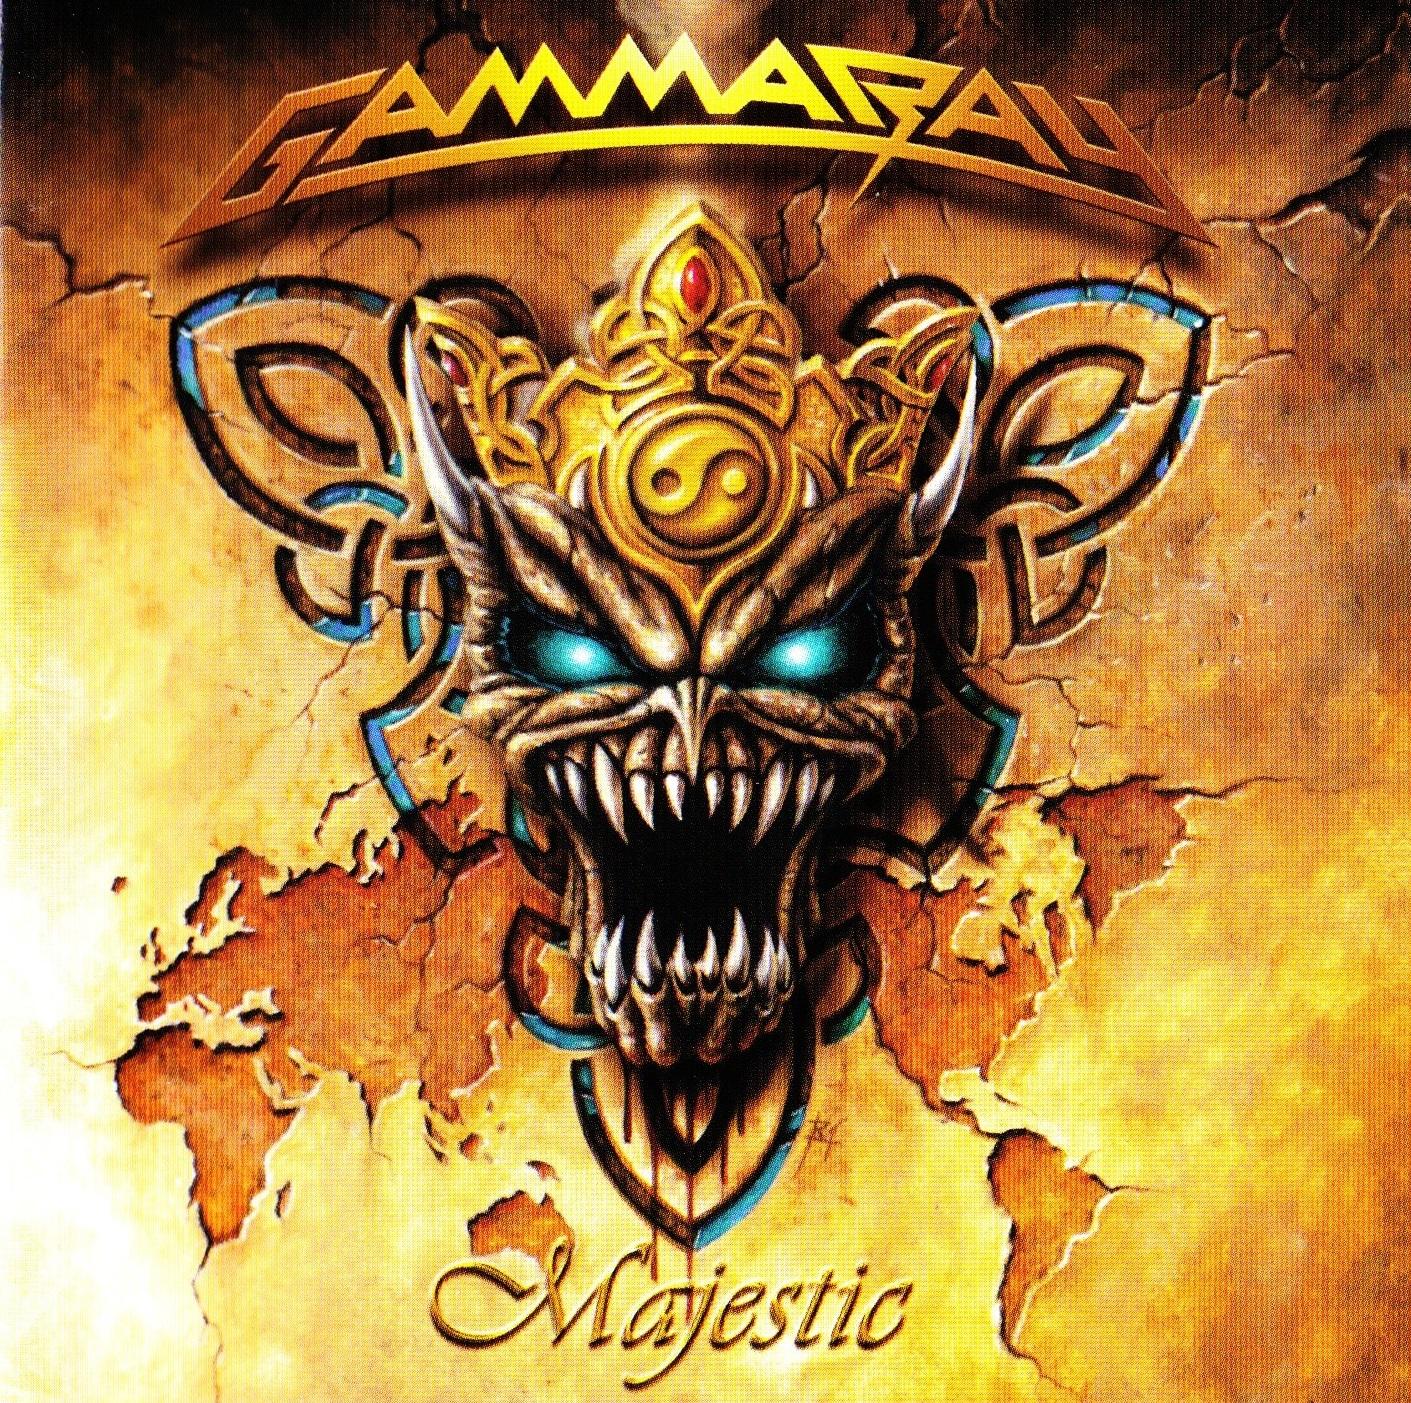 Gamma Ray — Majestic (2005)